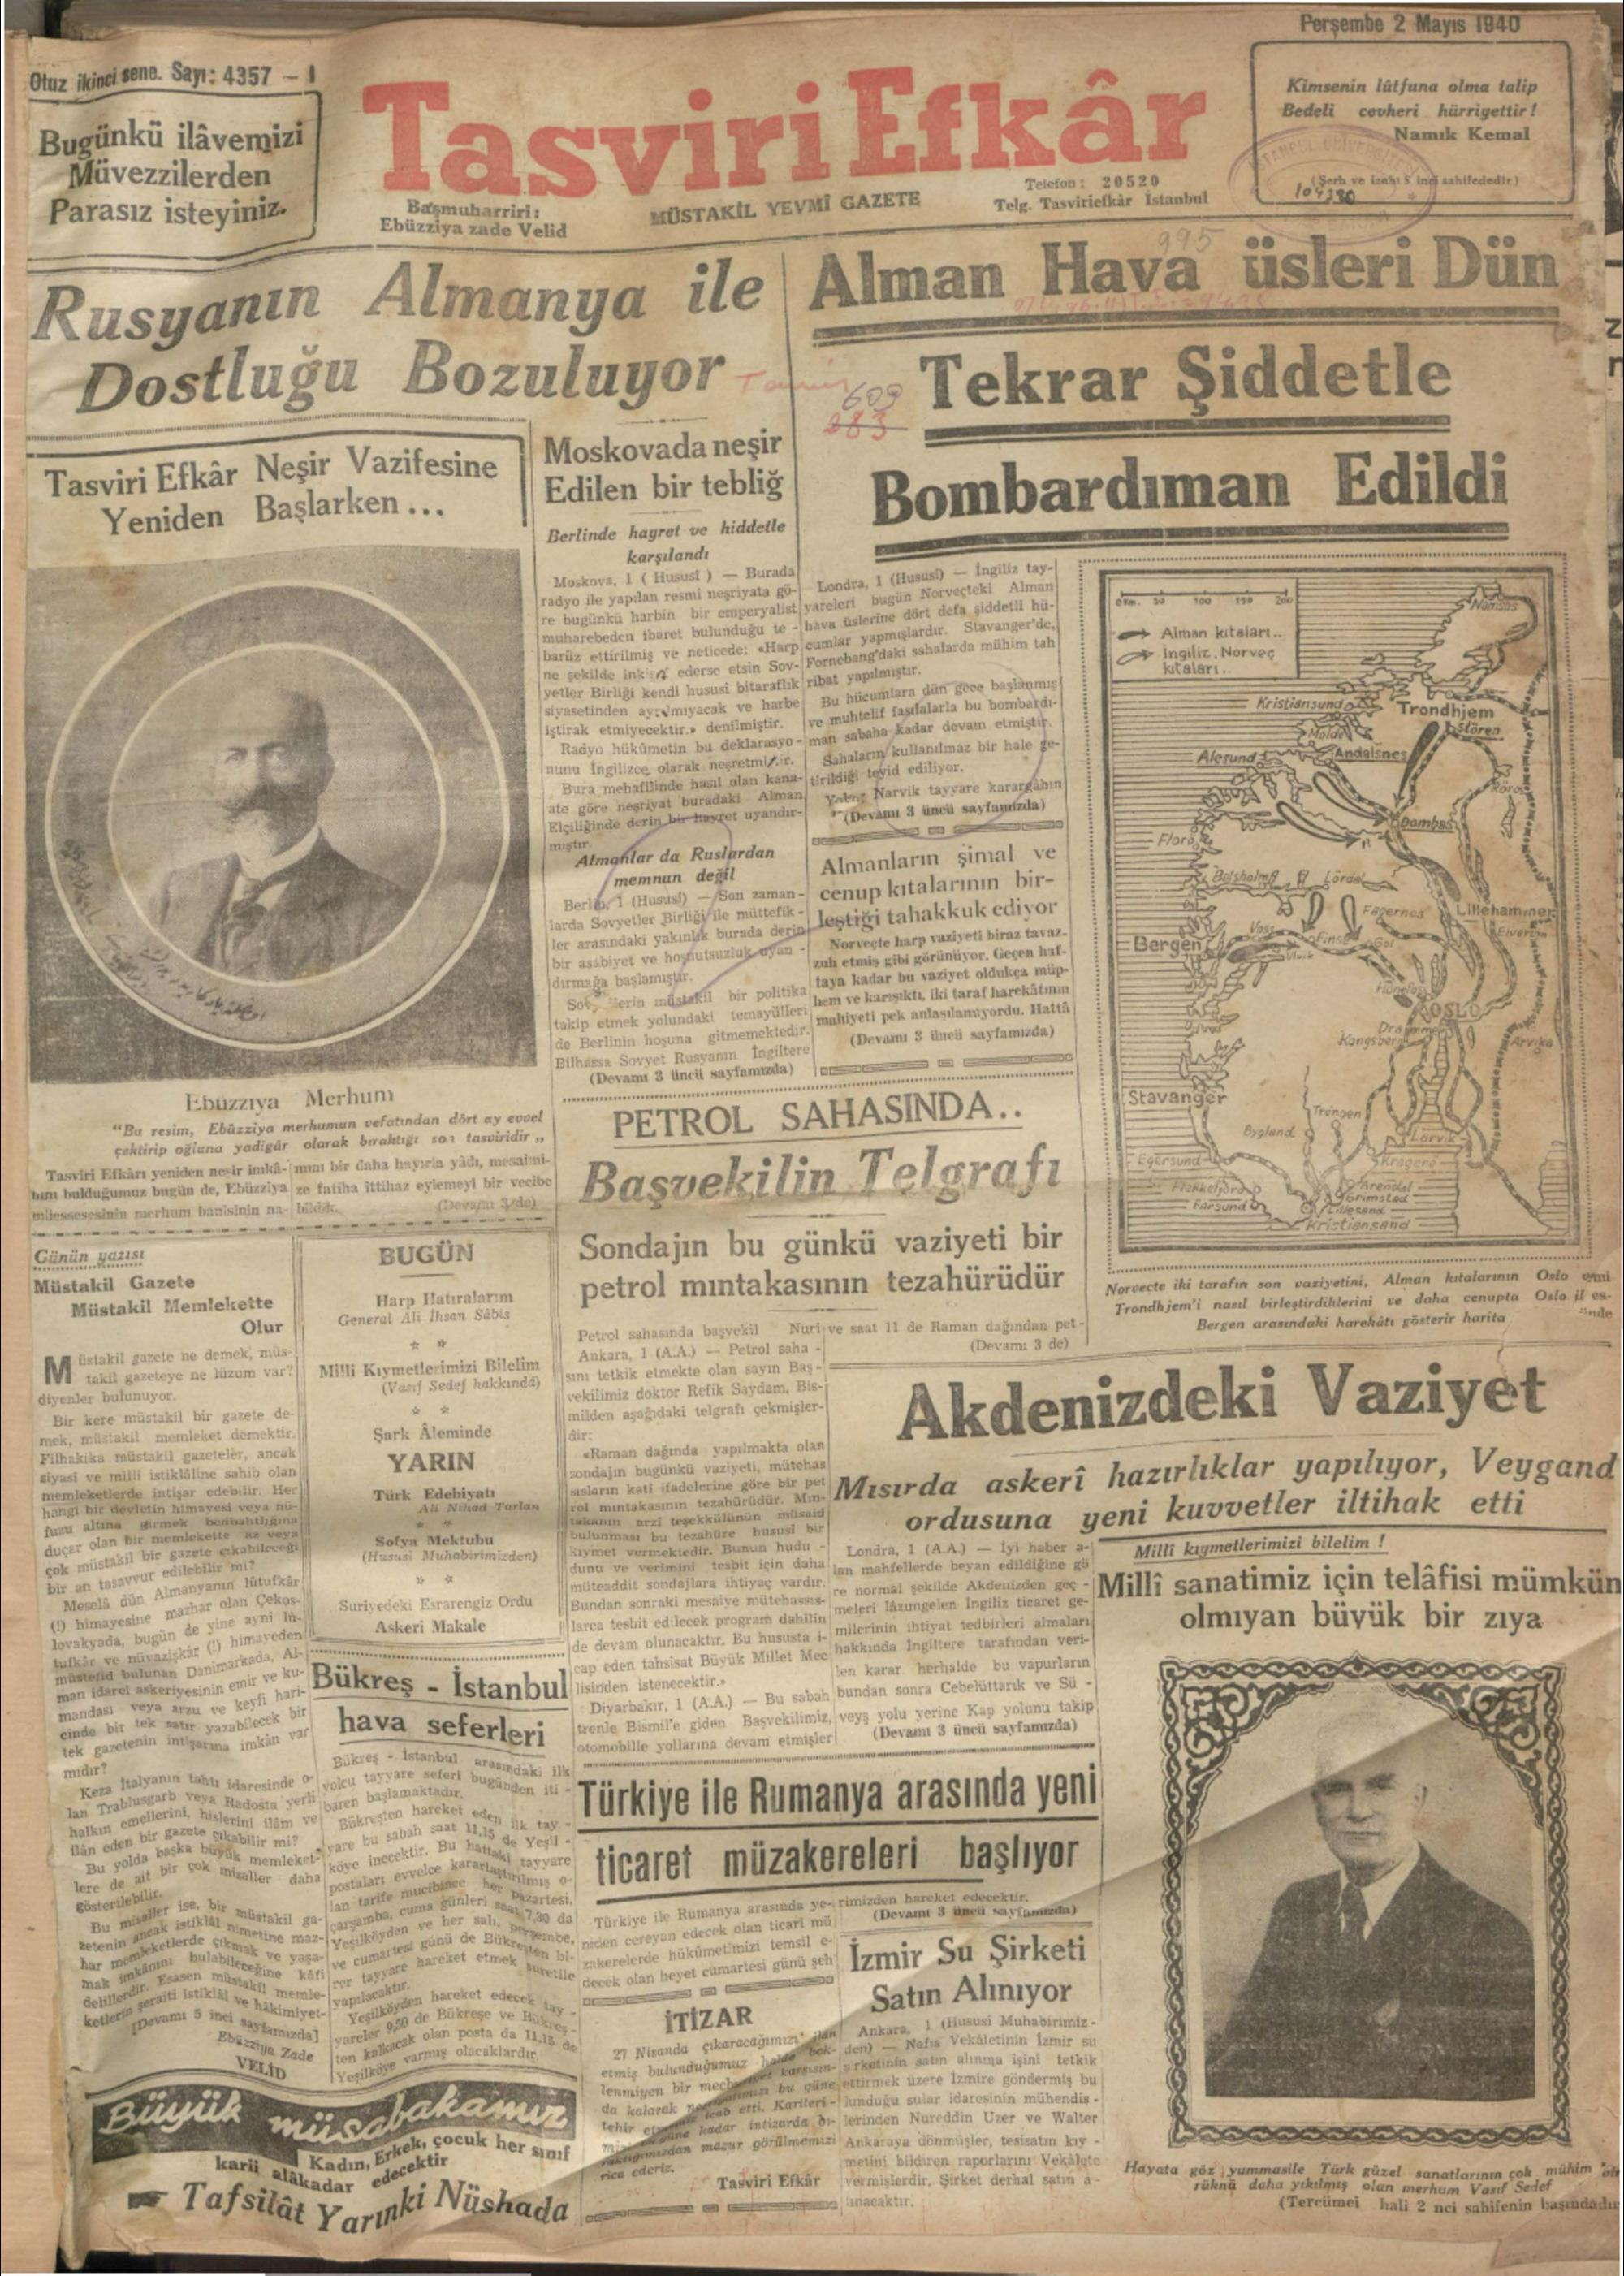 2 Mayıs 1940 Tarihli Tasviri Efkar Gazetesi Sayfa 1